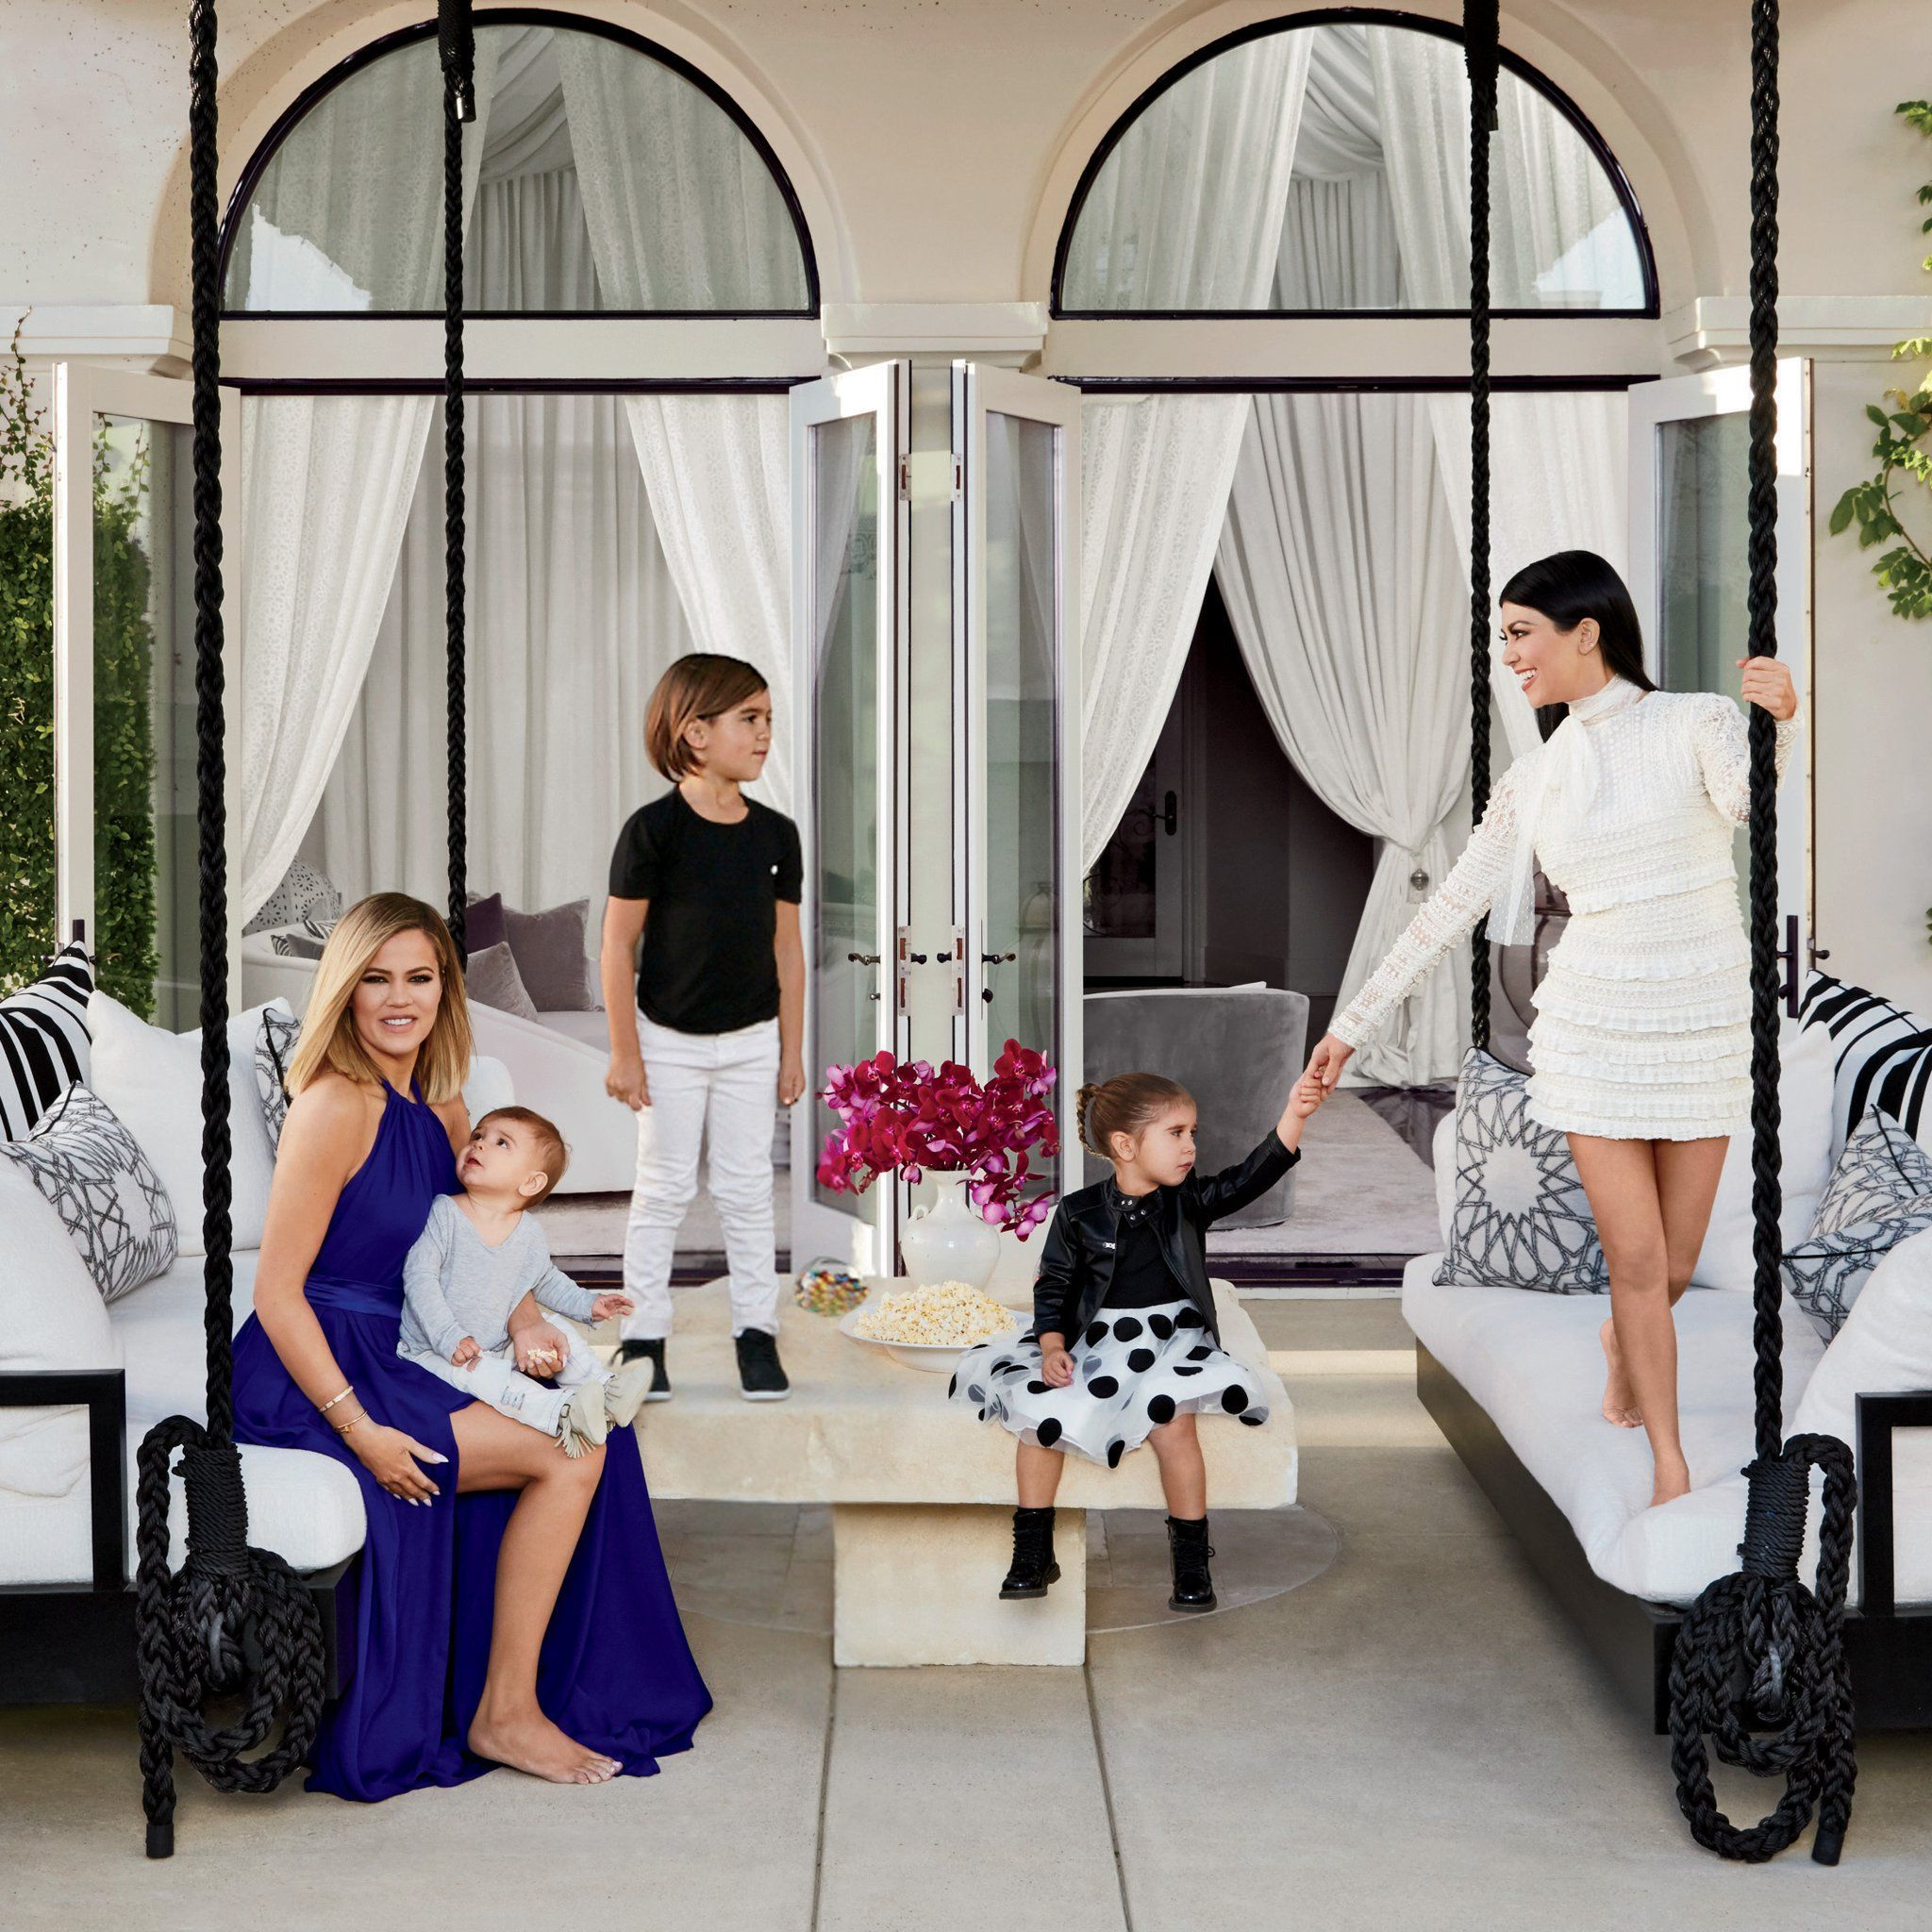 Image result for khloe kardashian house #khloekardashianhouse Image result for khloe kardashian house #khloekardashianhouse